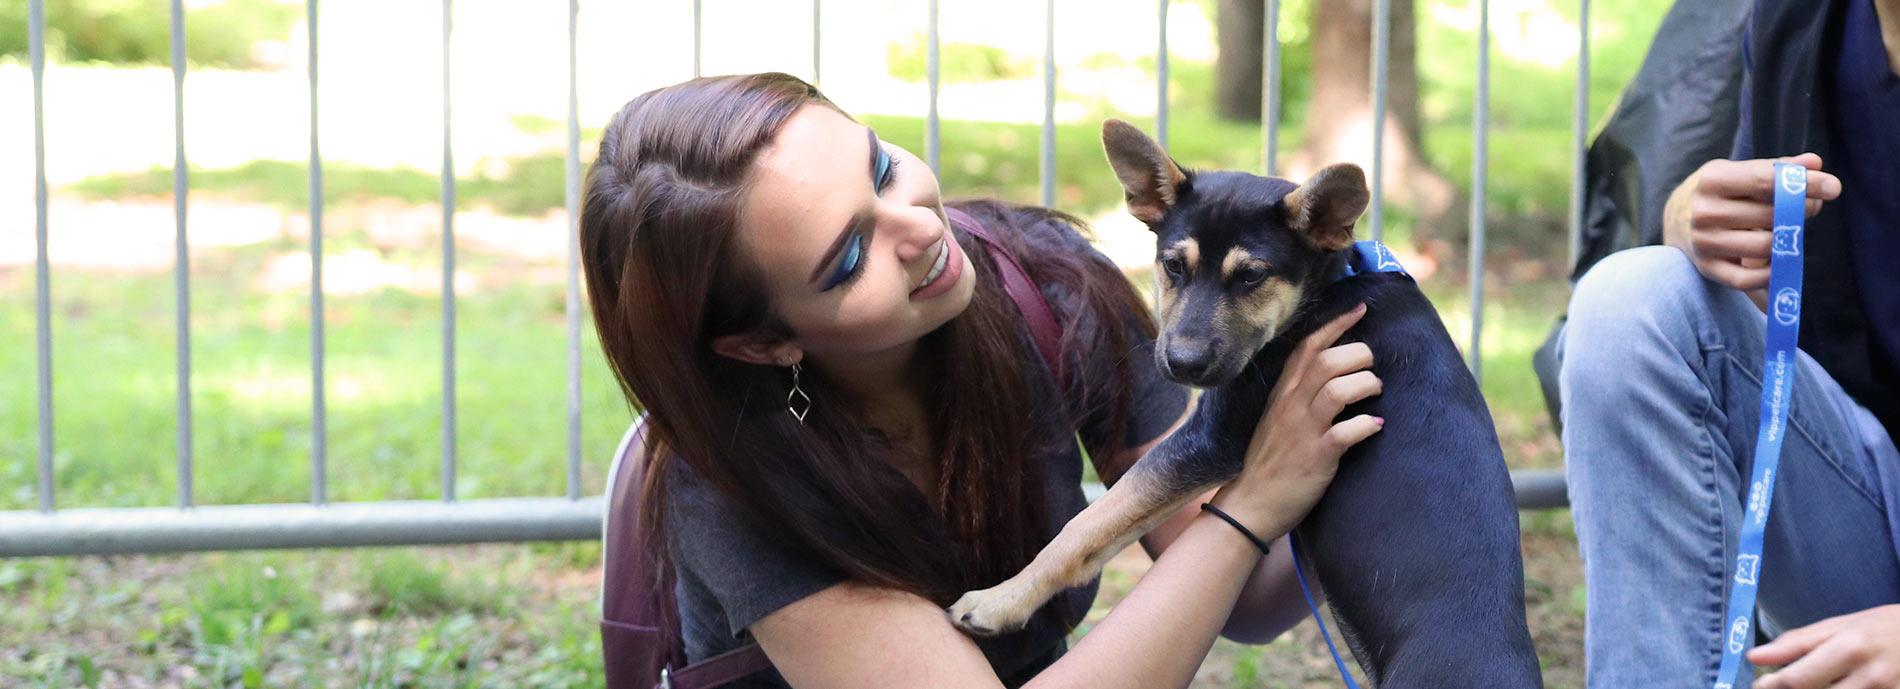 Pet Parents In Need